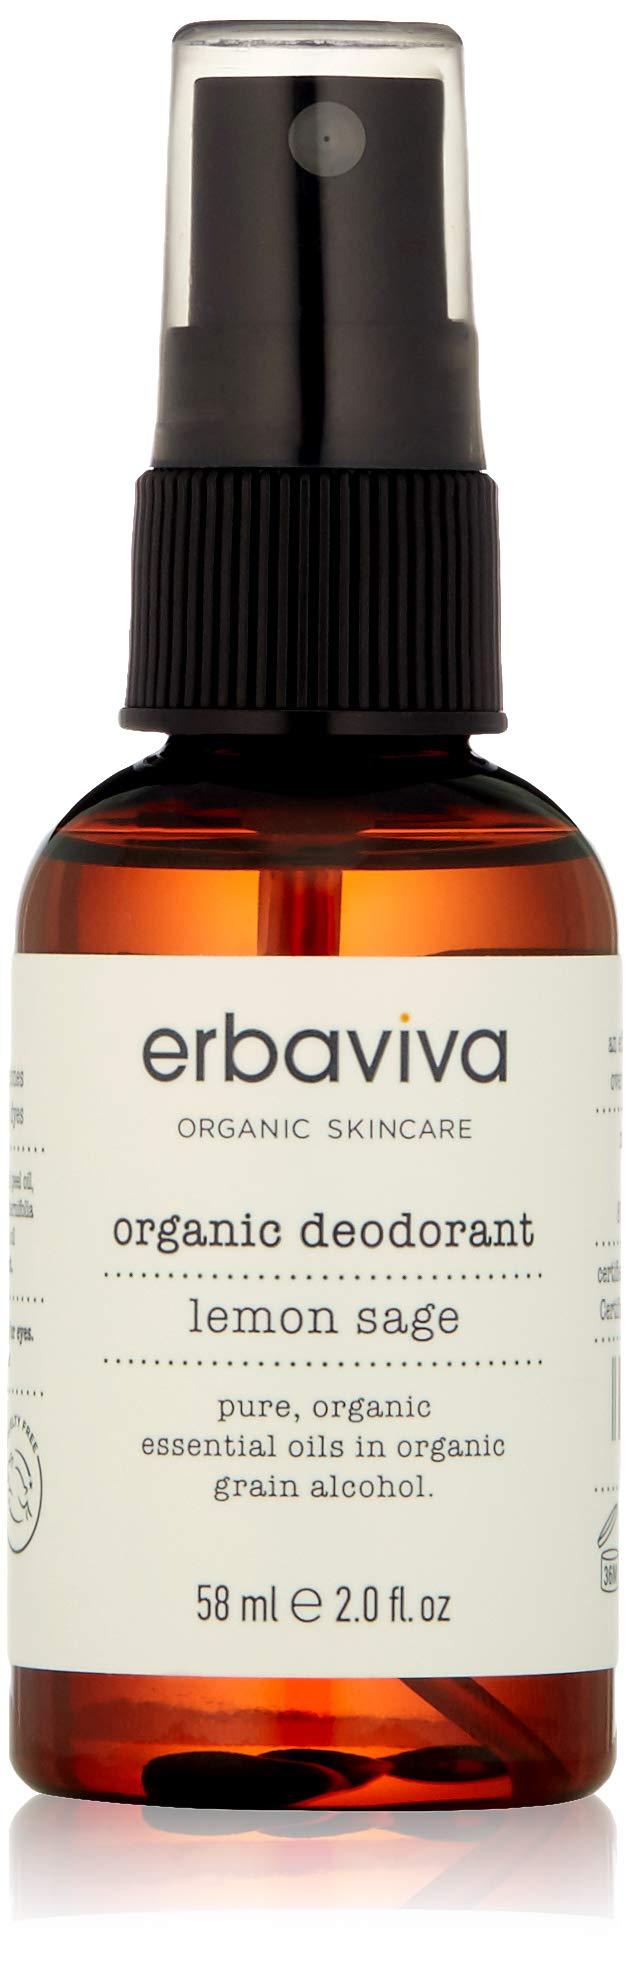 erbaviva Organic Deodorant, Lemon & Sage, 2 Fl Oz